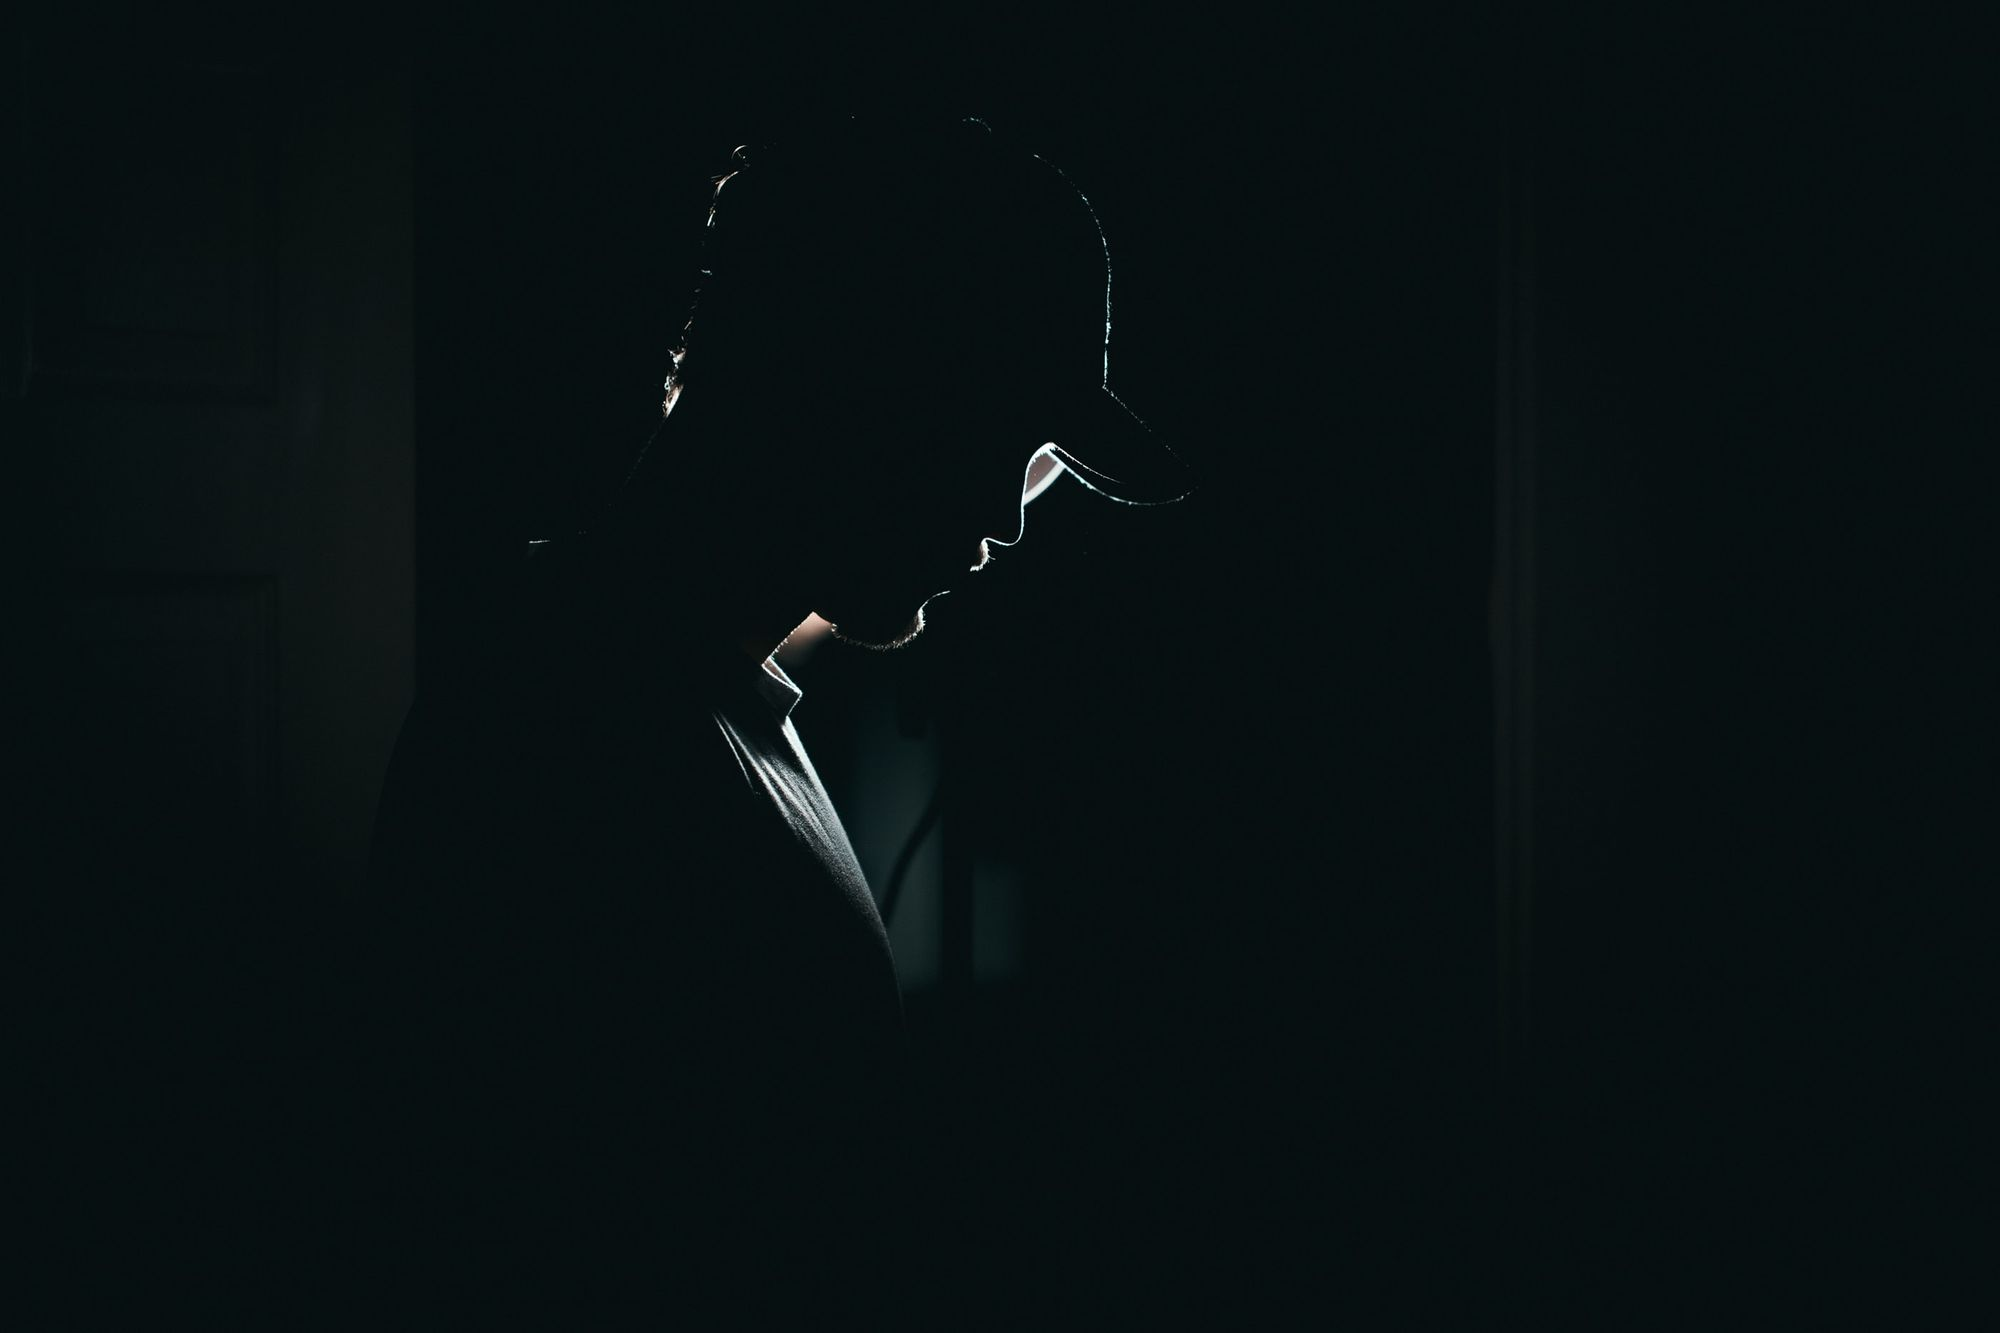 sidelight or chiaroscuro cinematography lighting